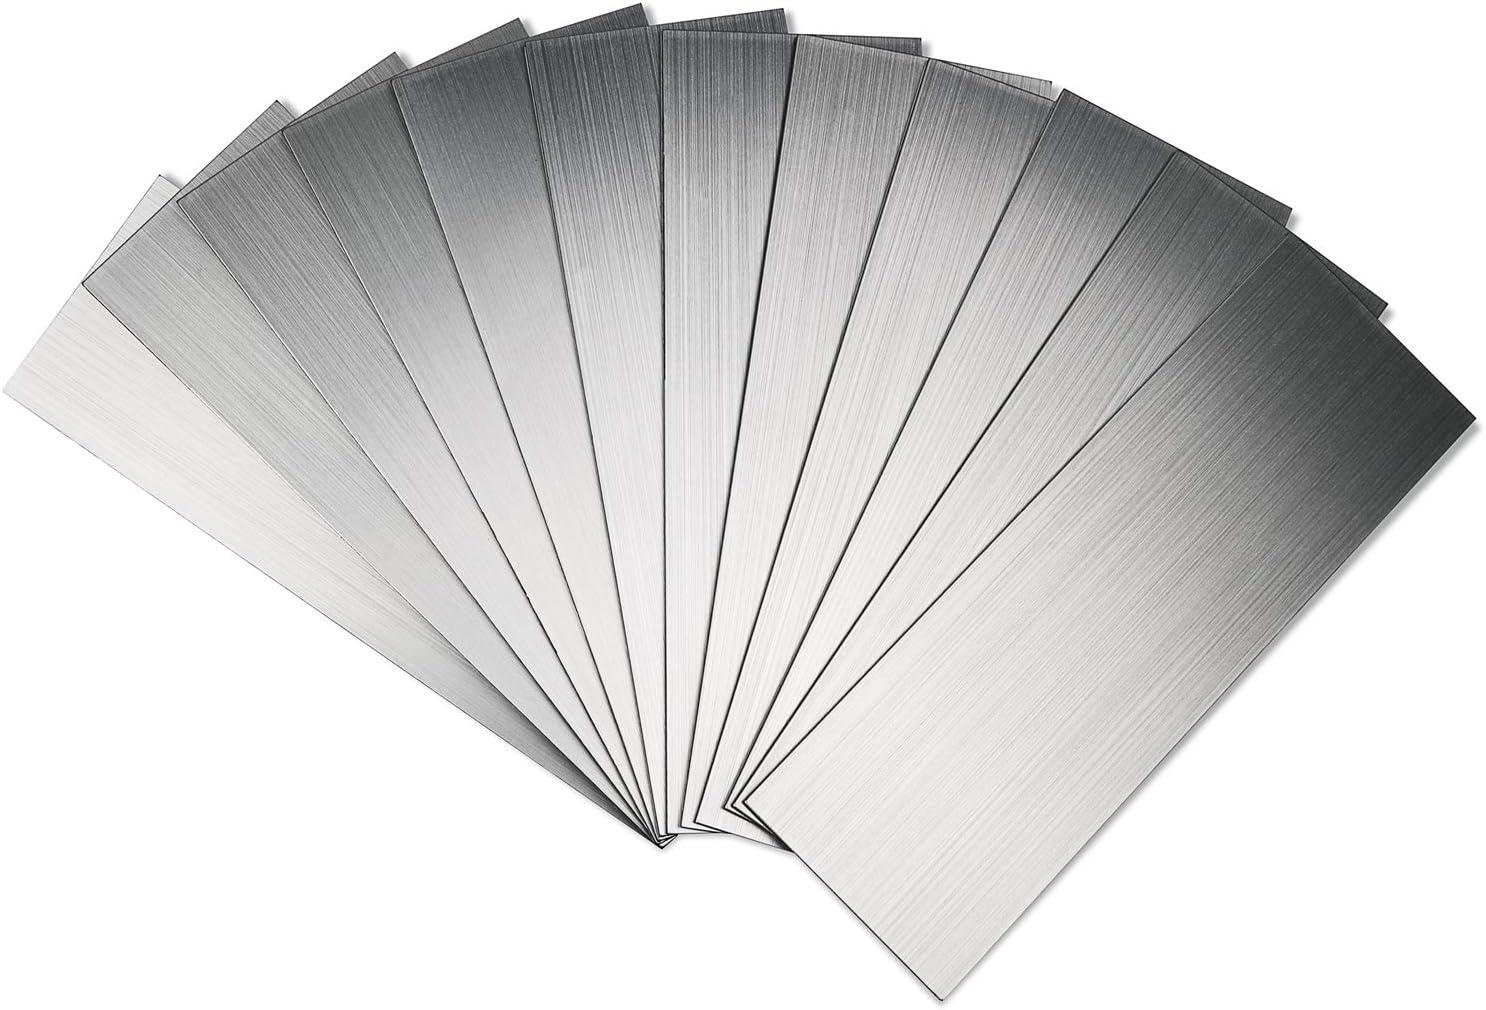 "Art3d 4"" x 12"" Peel and Stick Stainless Steel Metal Tile for Kitchen, Subway Backsplash (15 Pack)"